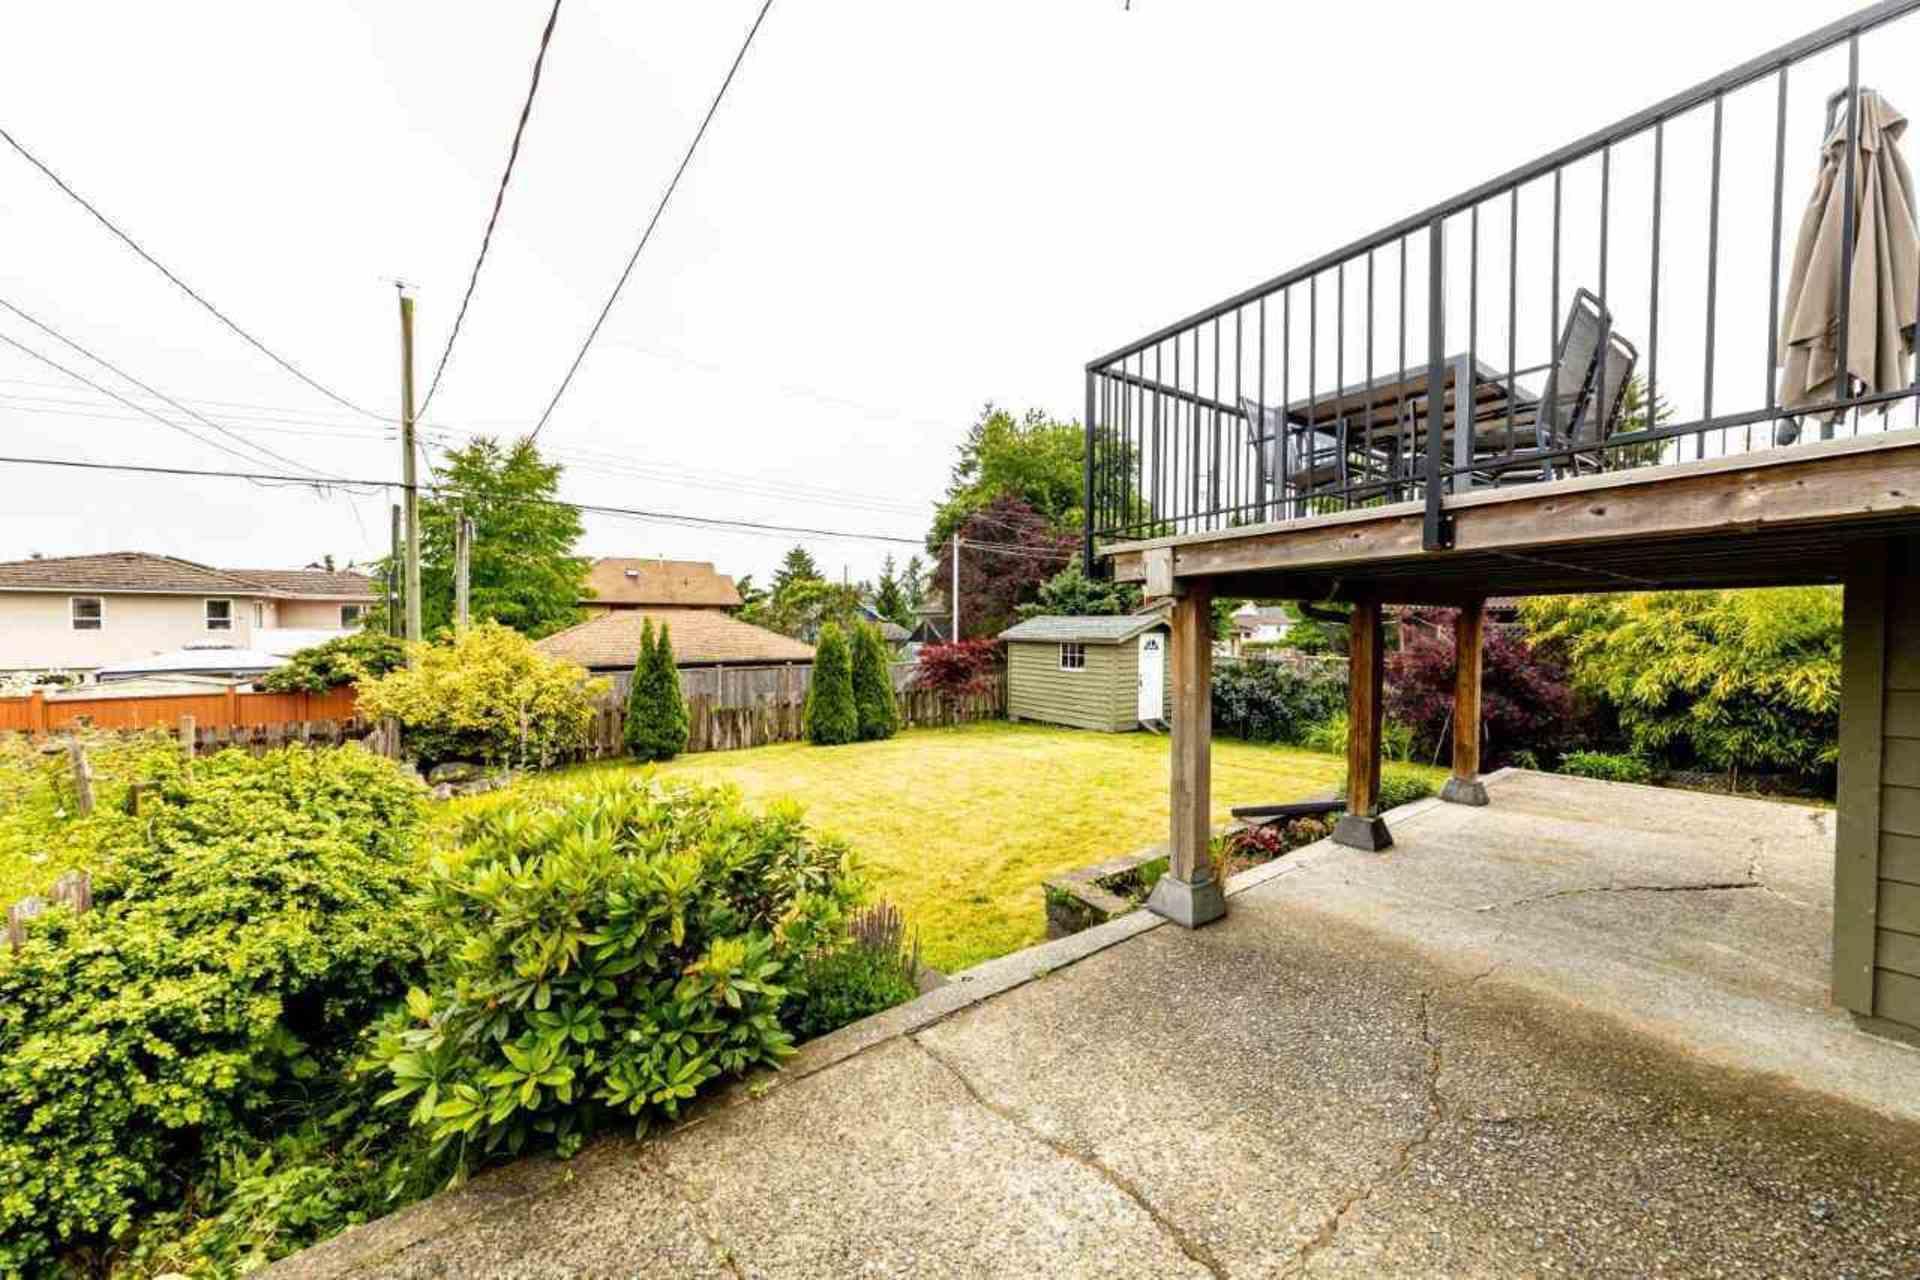 819-e-14th-street-boulevard-north-vancouver-31 at 819 E 14th Street, Boulevard, North Vancouver